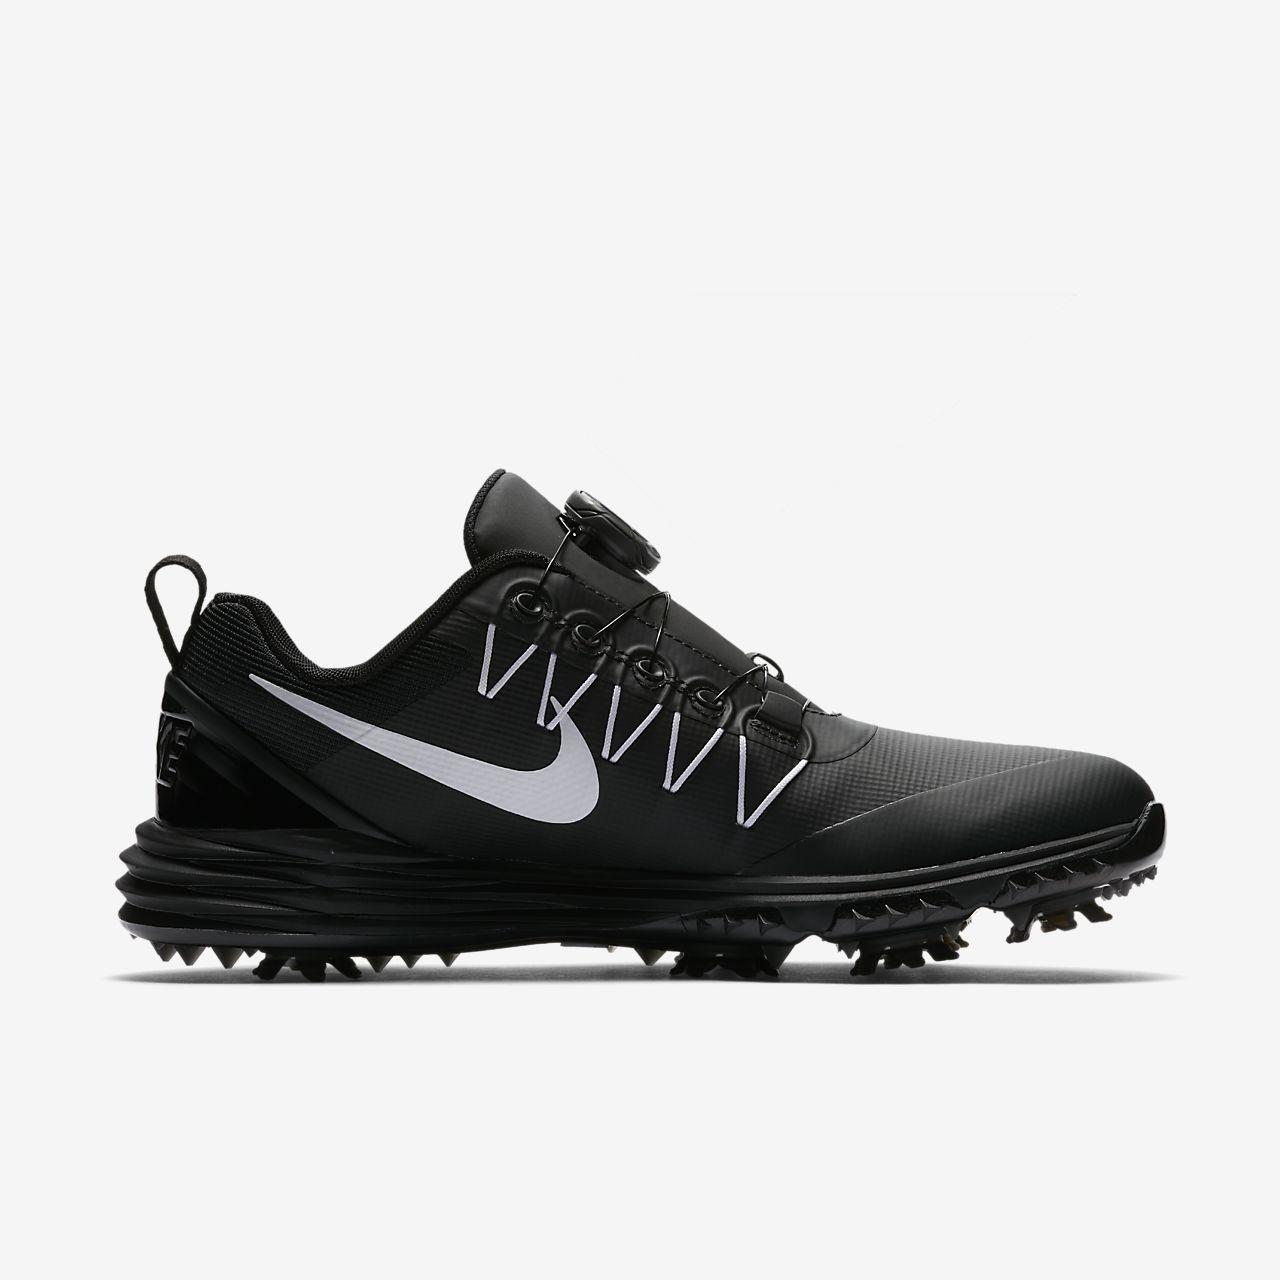 Nike Nike Women Lunar Command 2, 001 black/white 38.5 (UK 5)